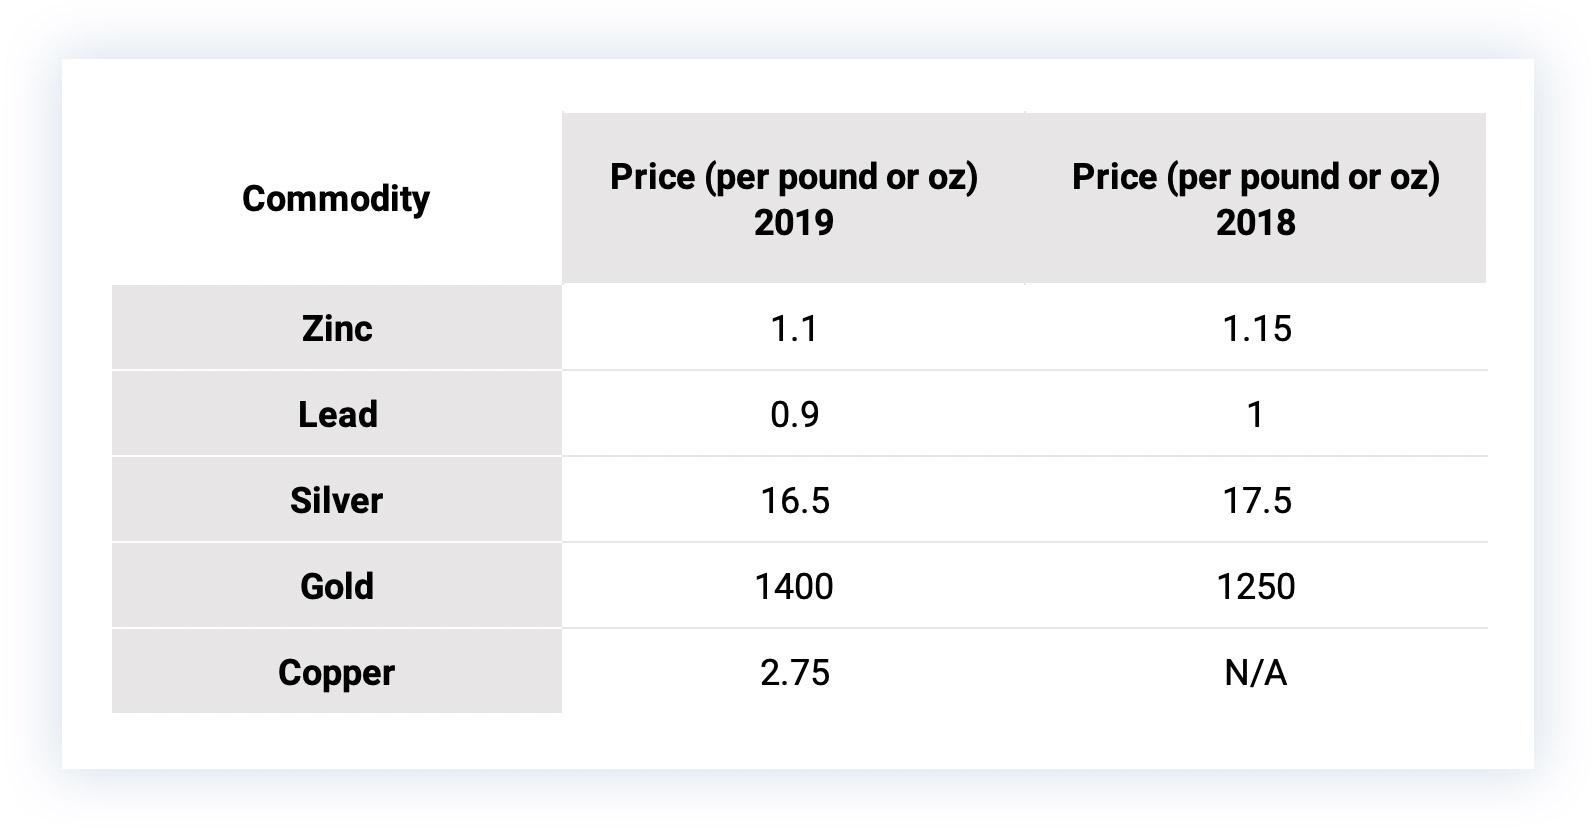 Caesars-Report-commodity-prices-compared-